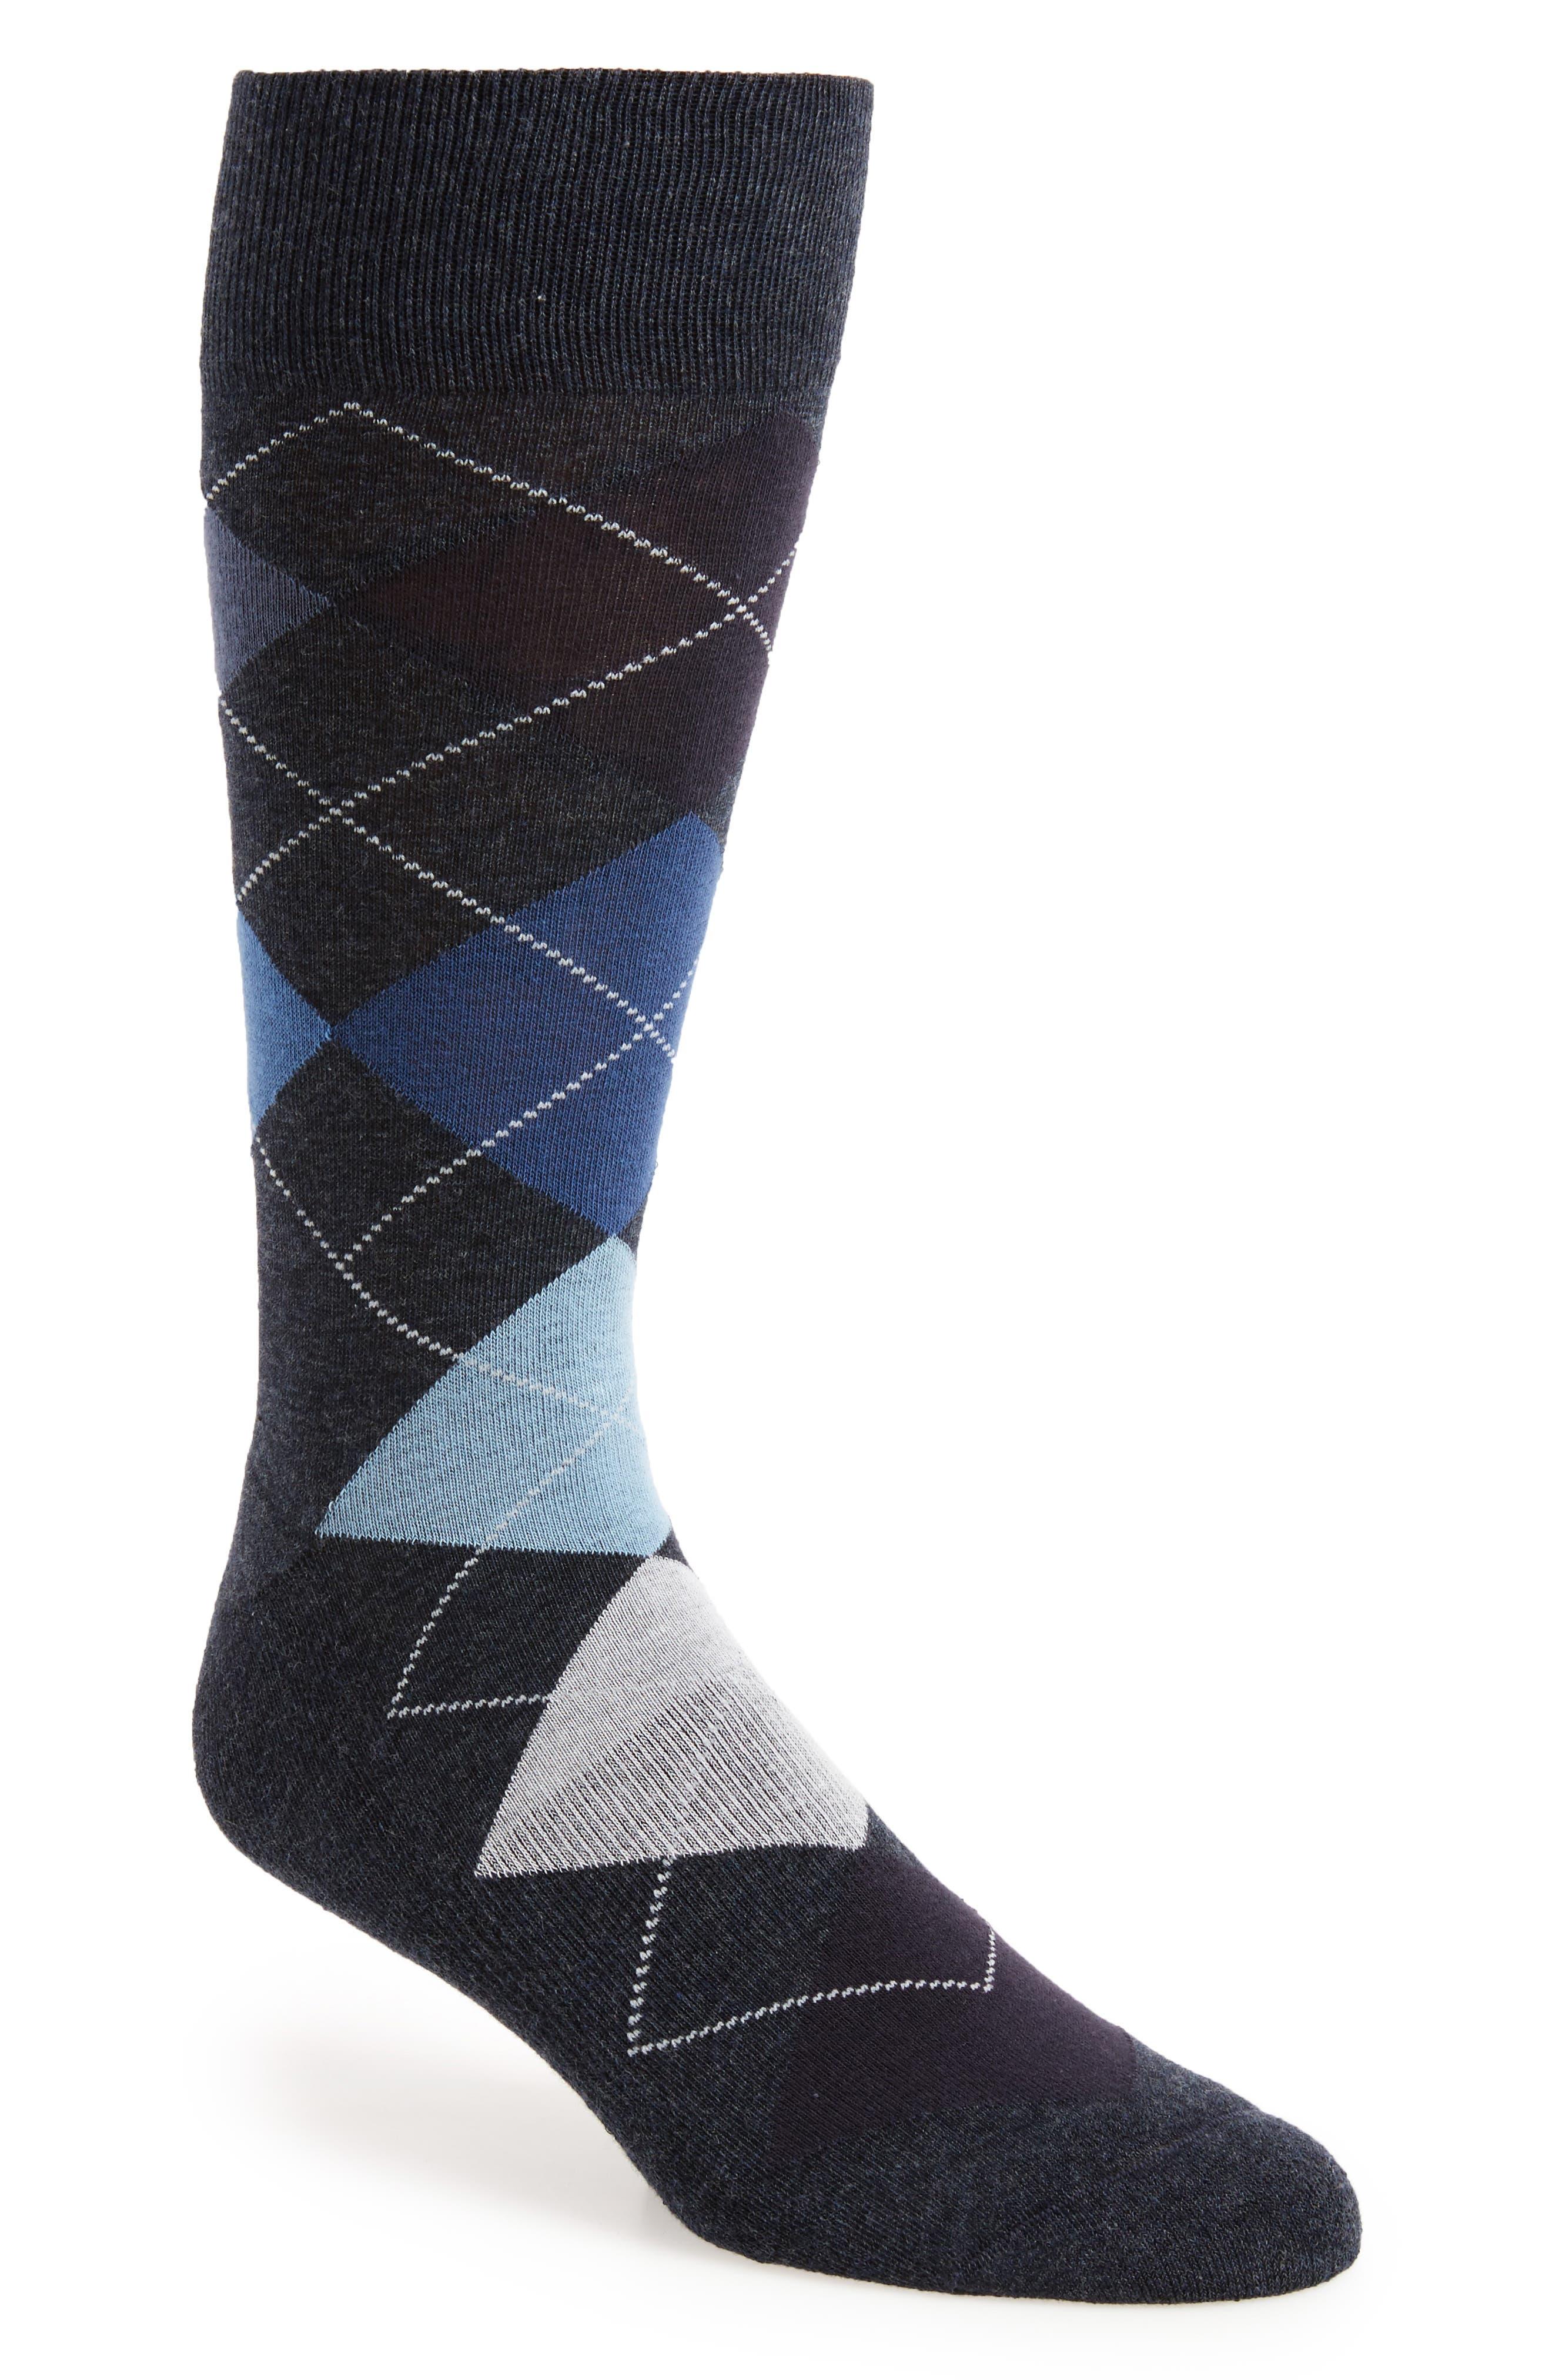 Nordstrom Men's Shop Gradient Argyle Socks (3 for $30)